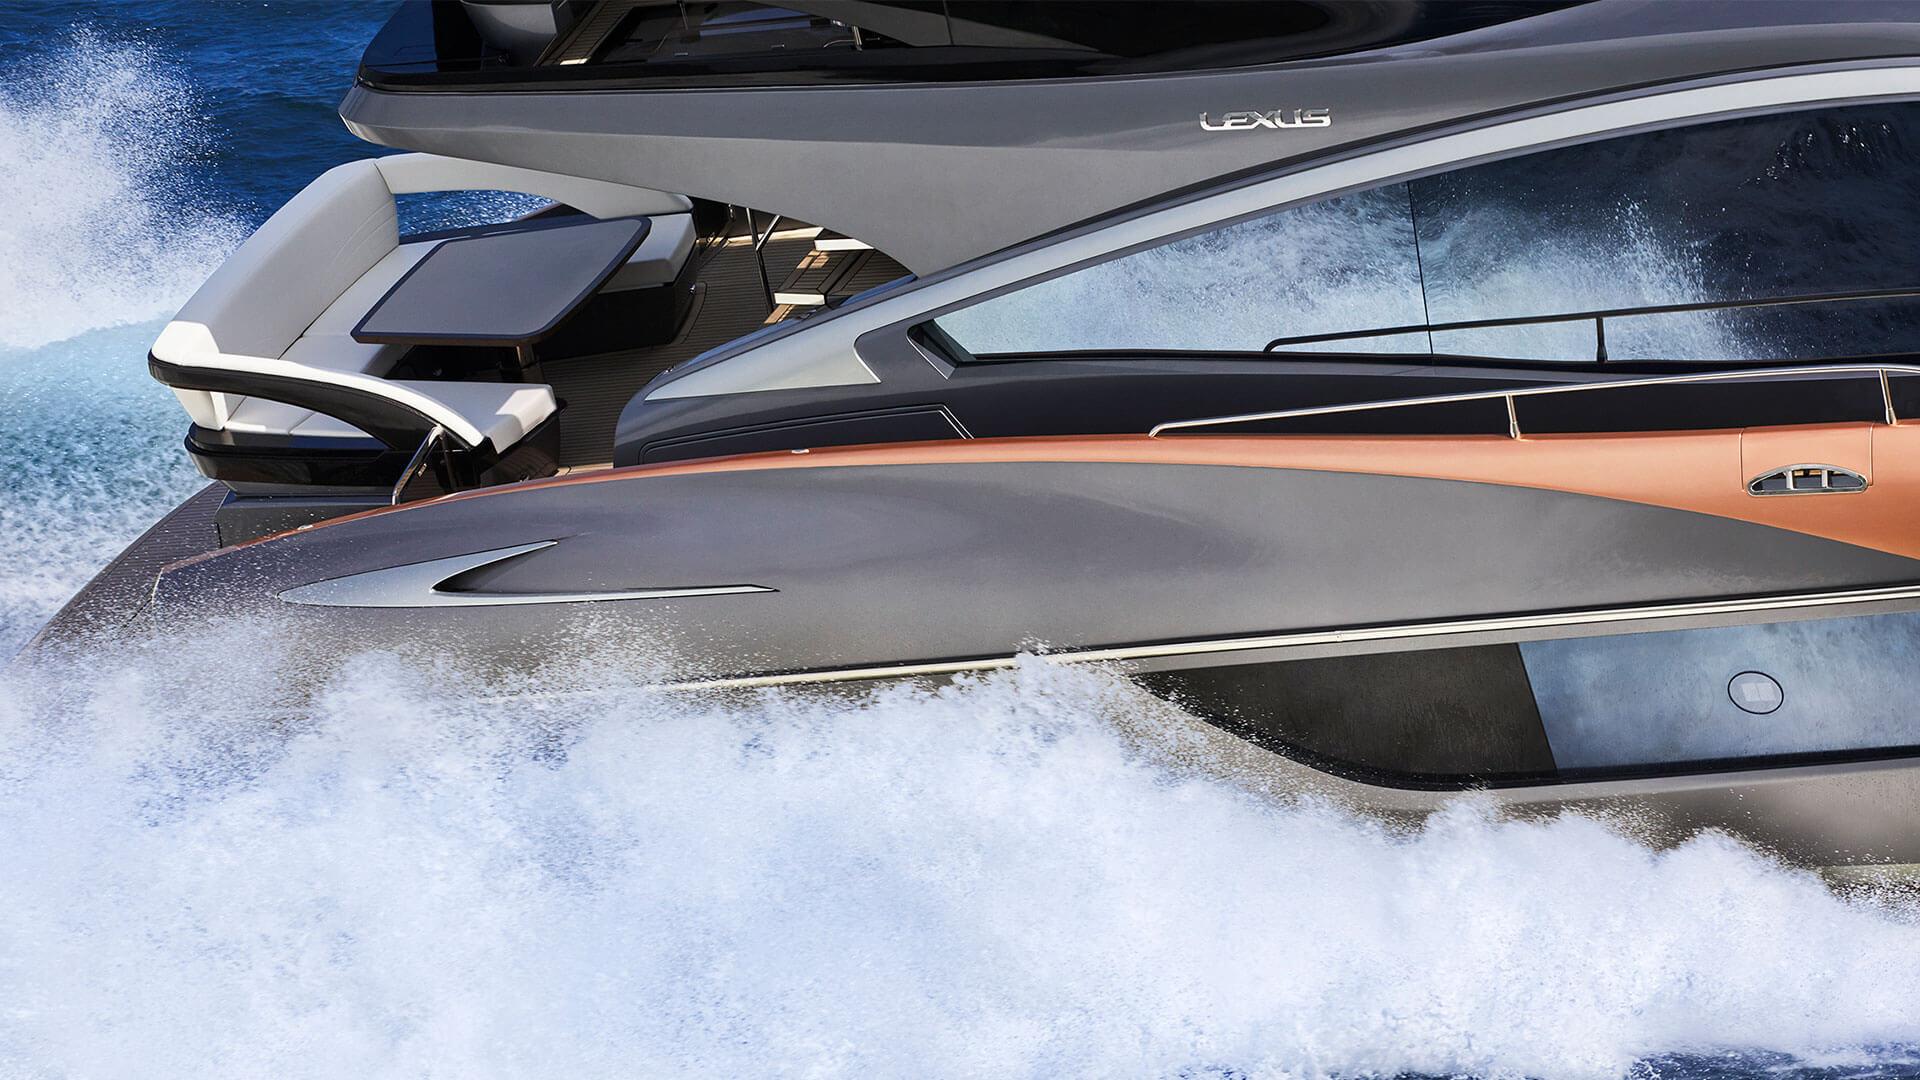 2020 lexus yacht ly 650 premiere gallery 08